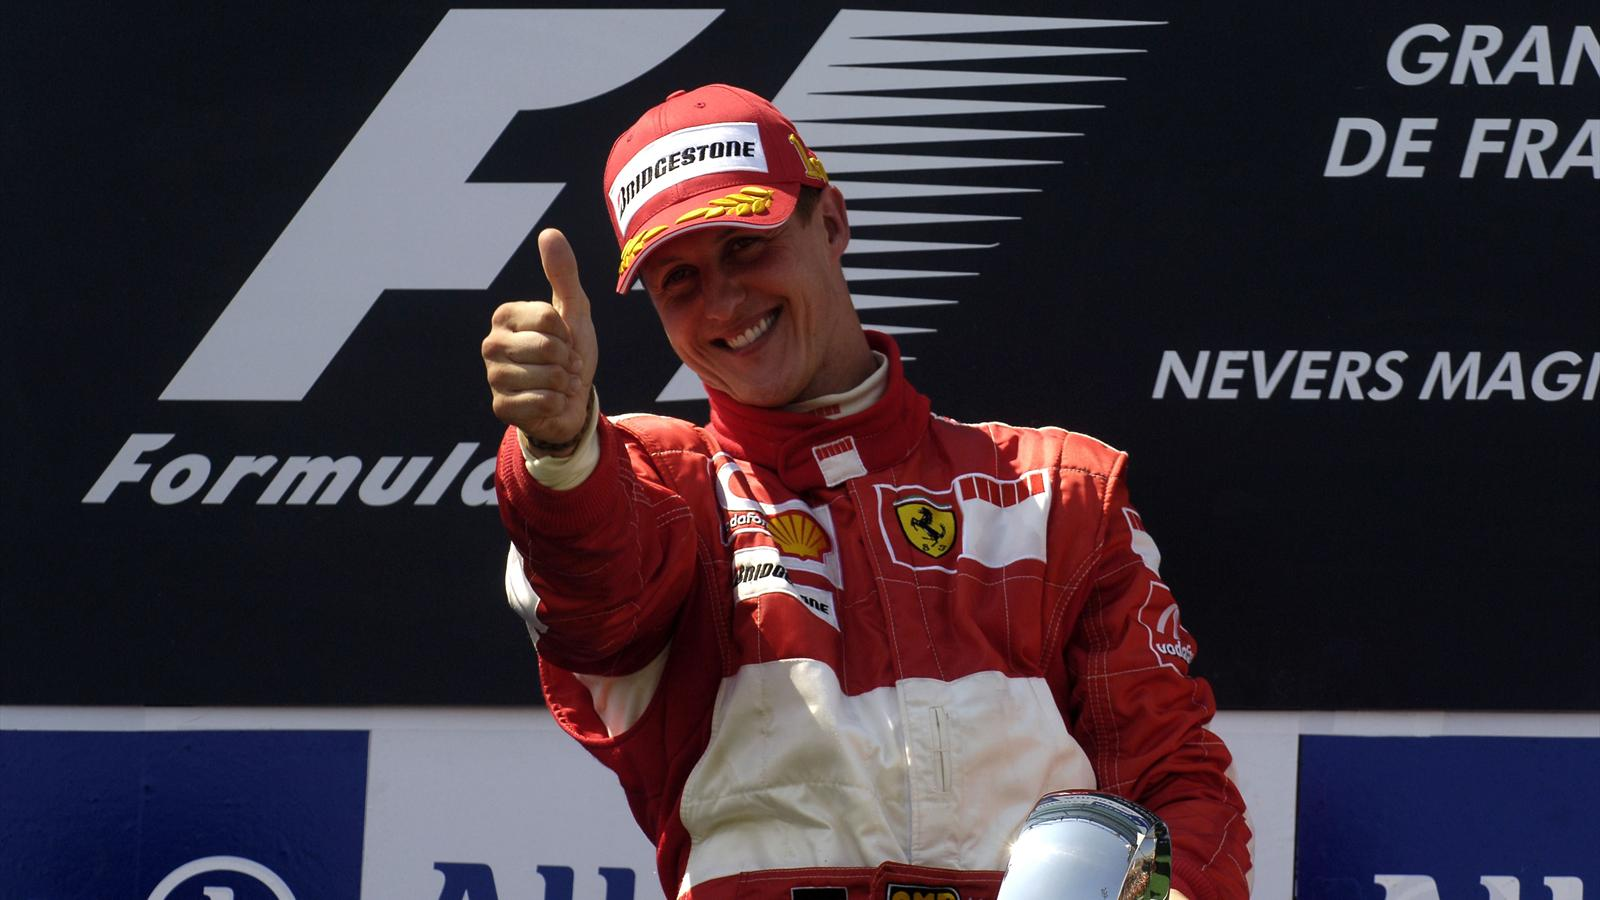 Шумахера признали лучшим пилотом вистории Феррари